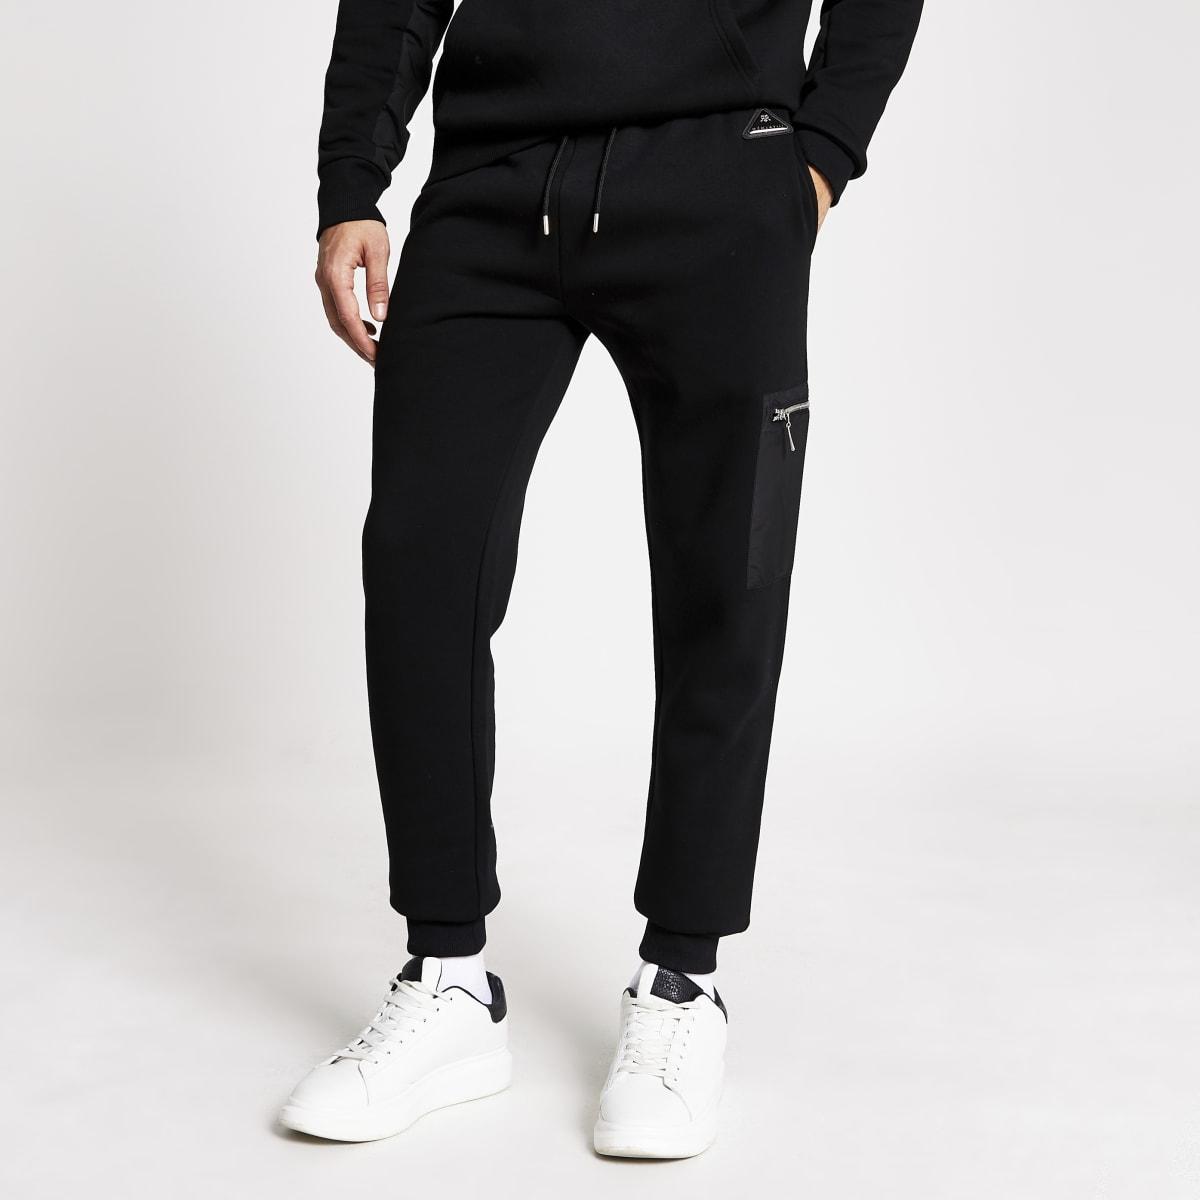 MCMLX - Zwarte nylon slim-fit joggingbroek